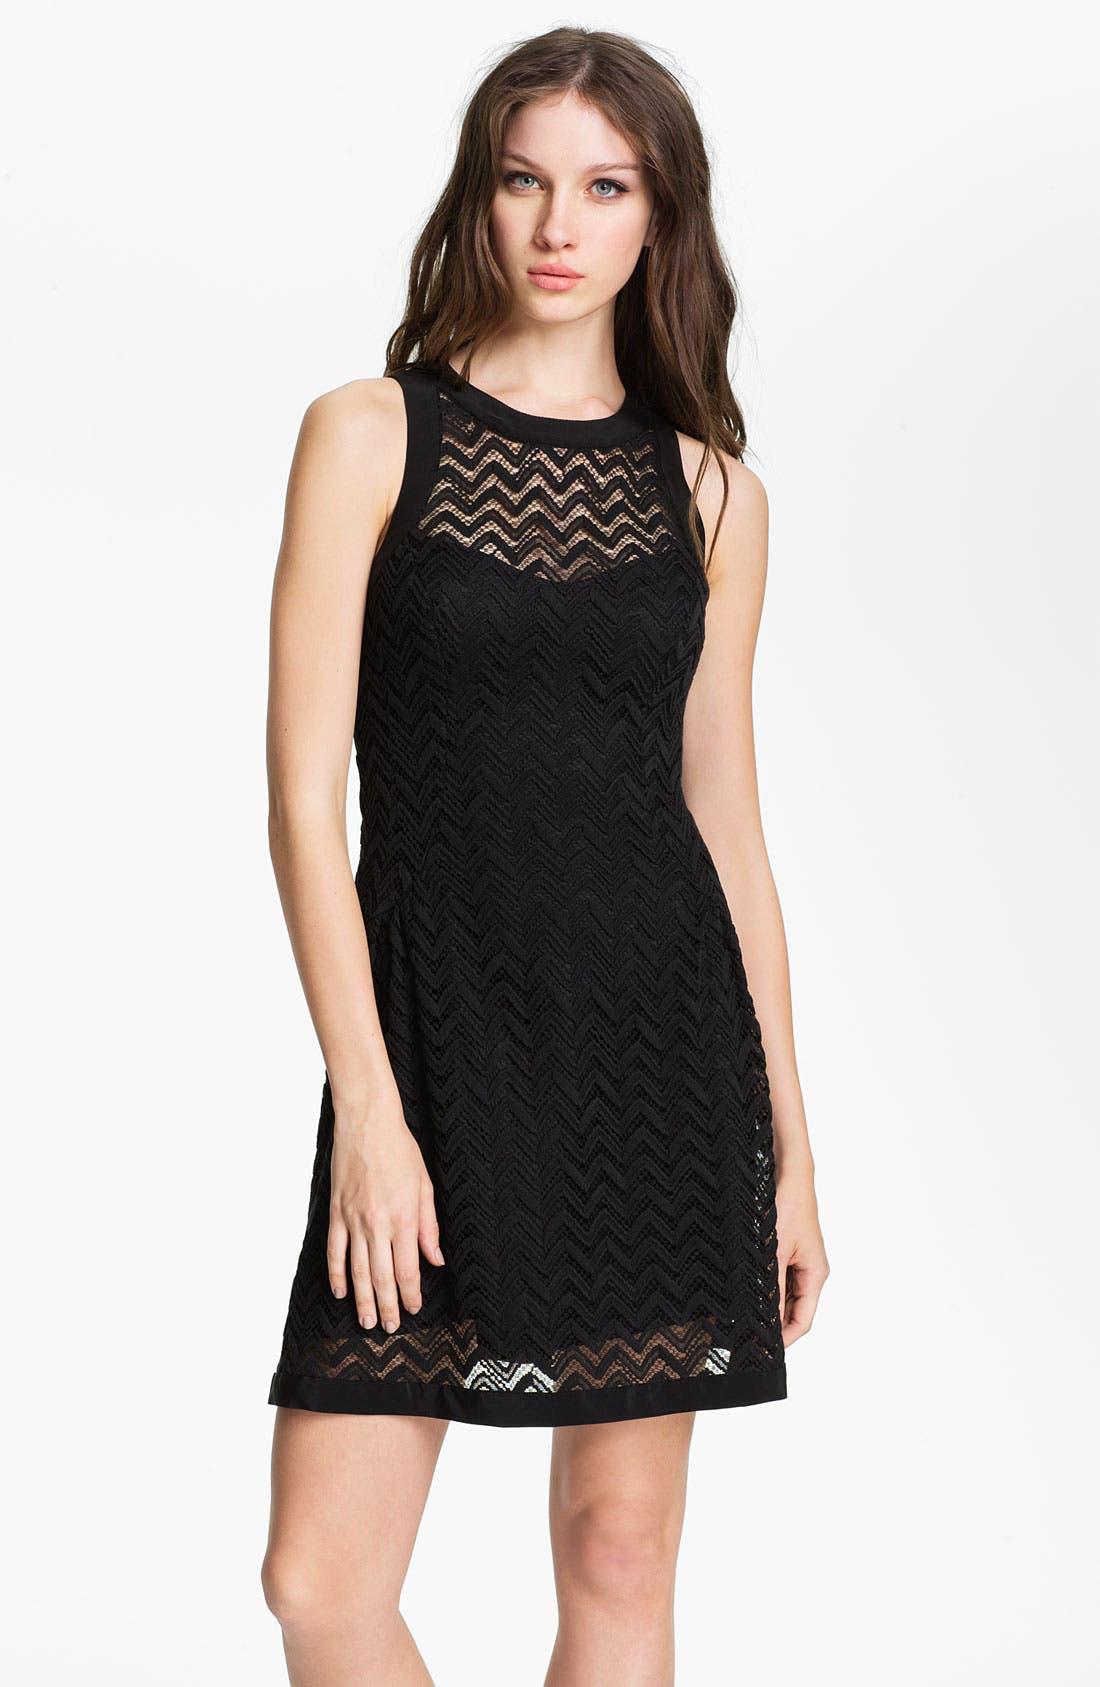 Main Image - Nanette Lepore 'Groovy' Knit Shift Dress